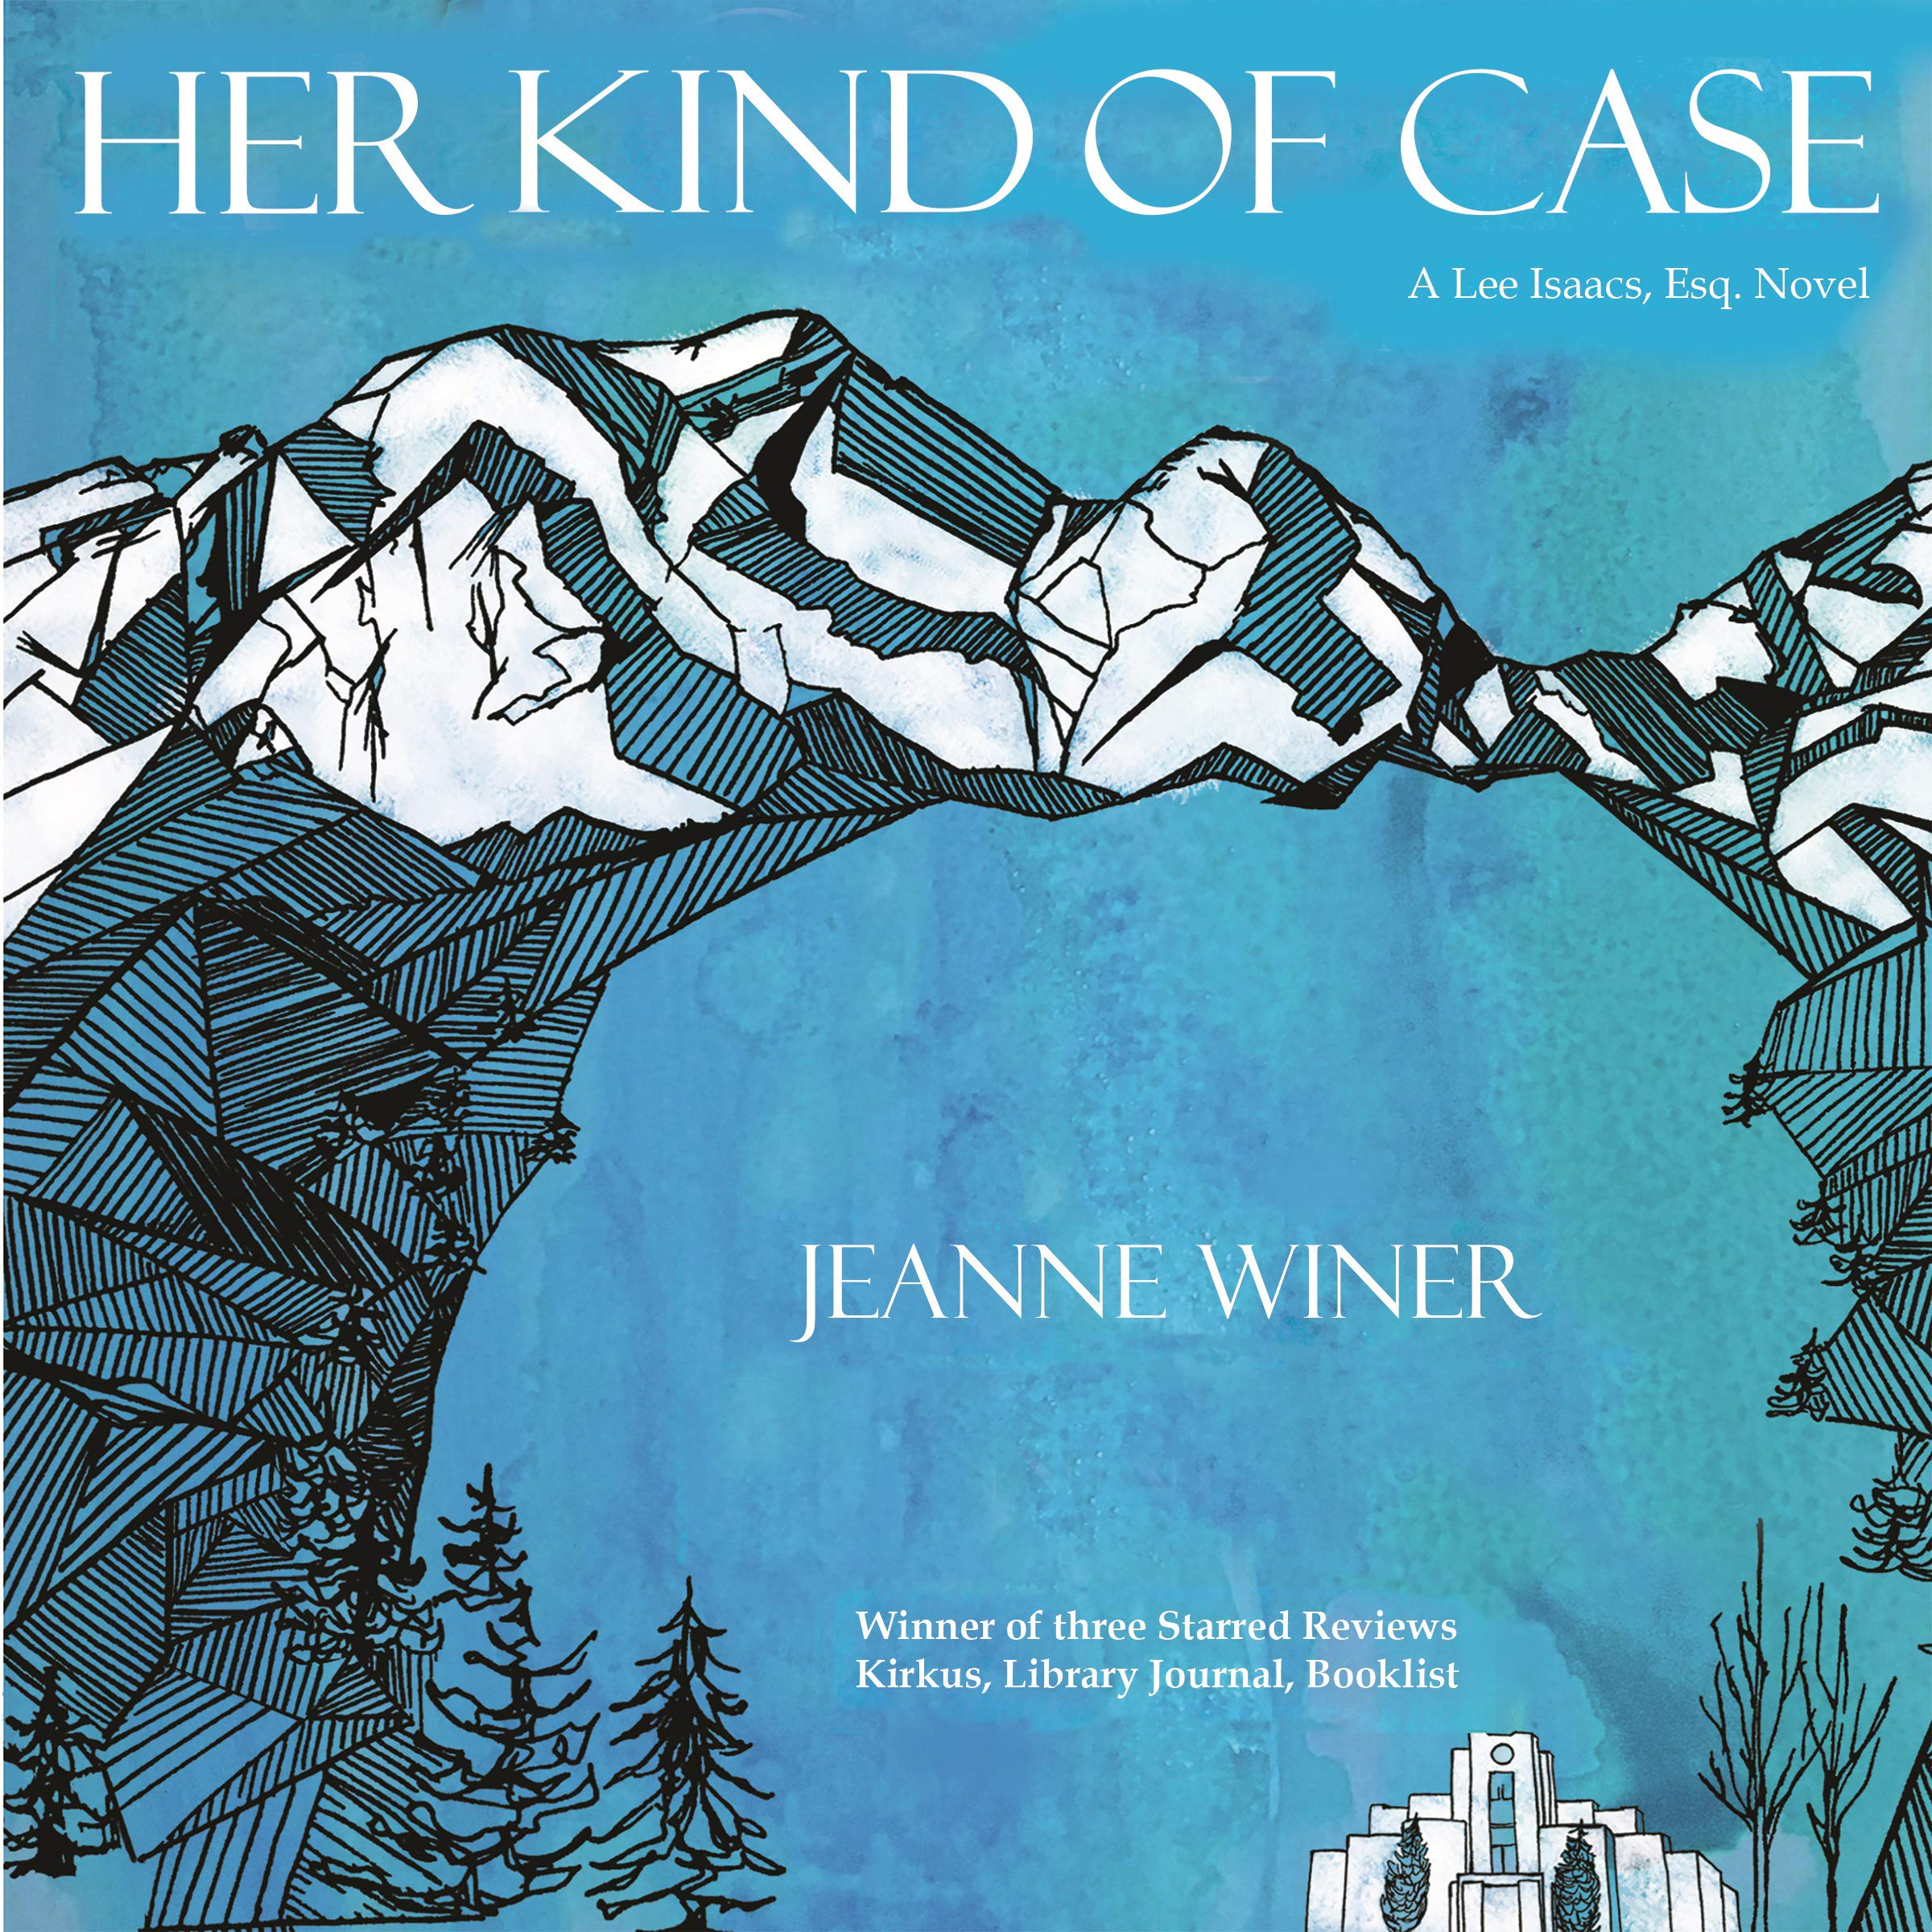 Her Kind of Case: A Lee Isaacs, Esq. Novel